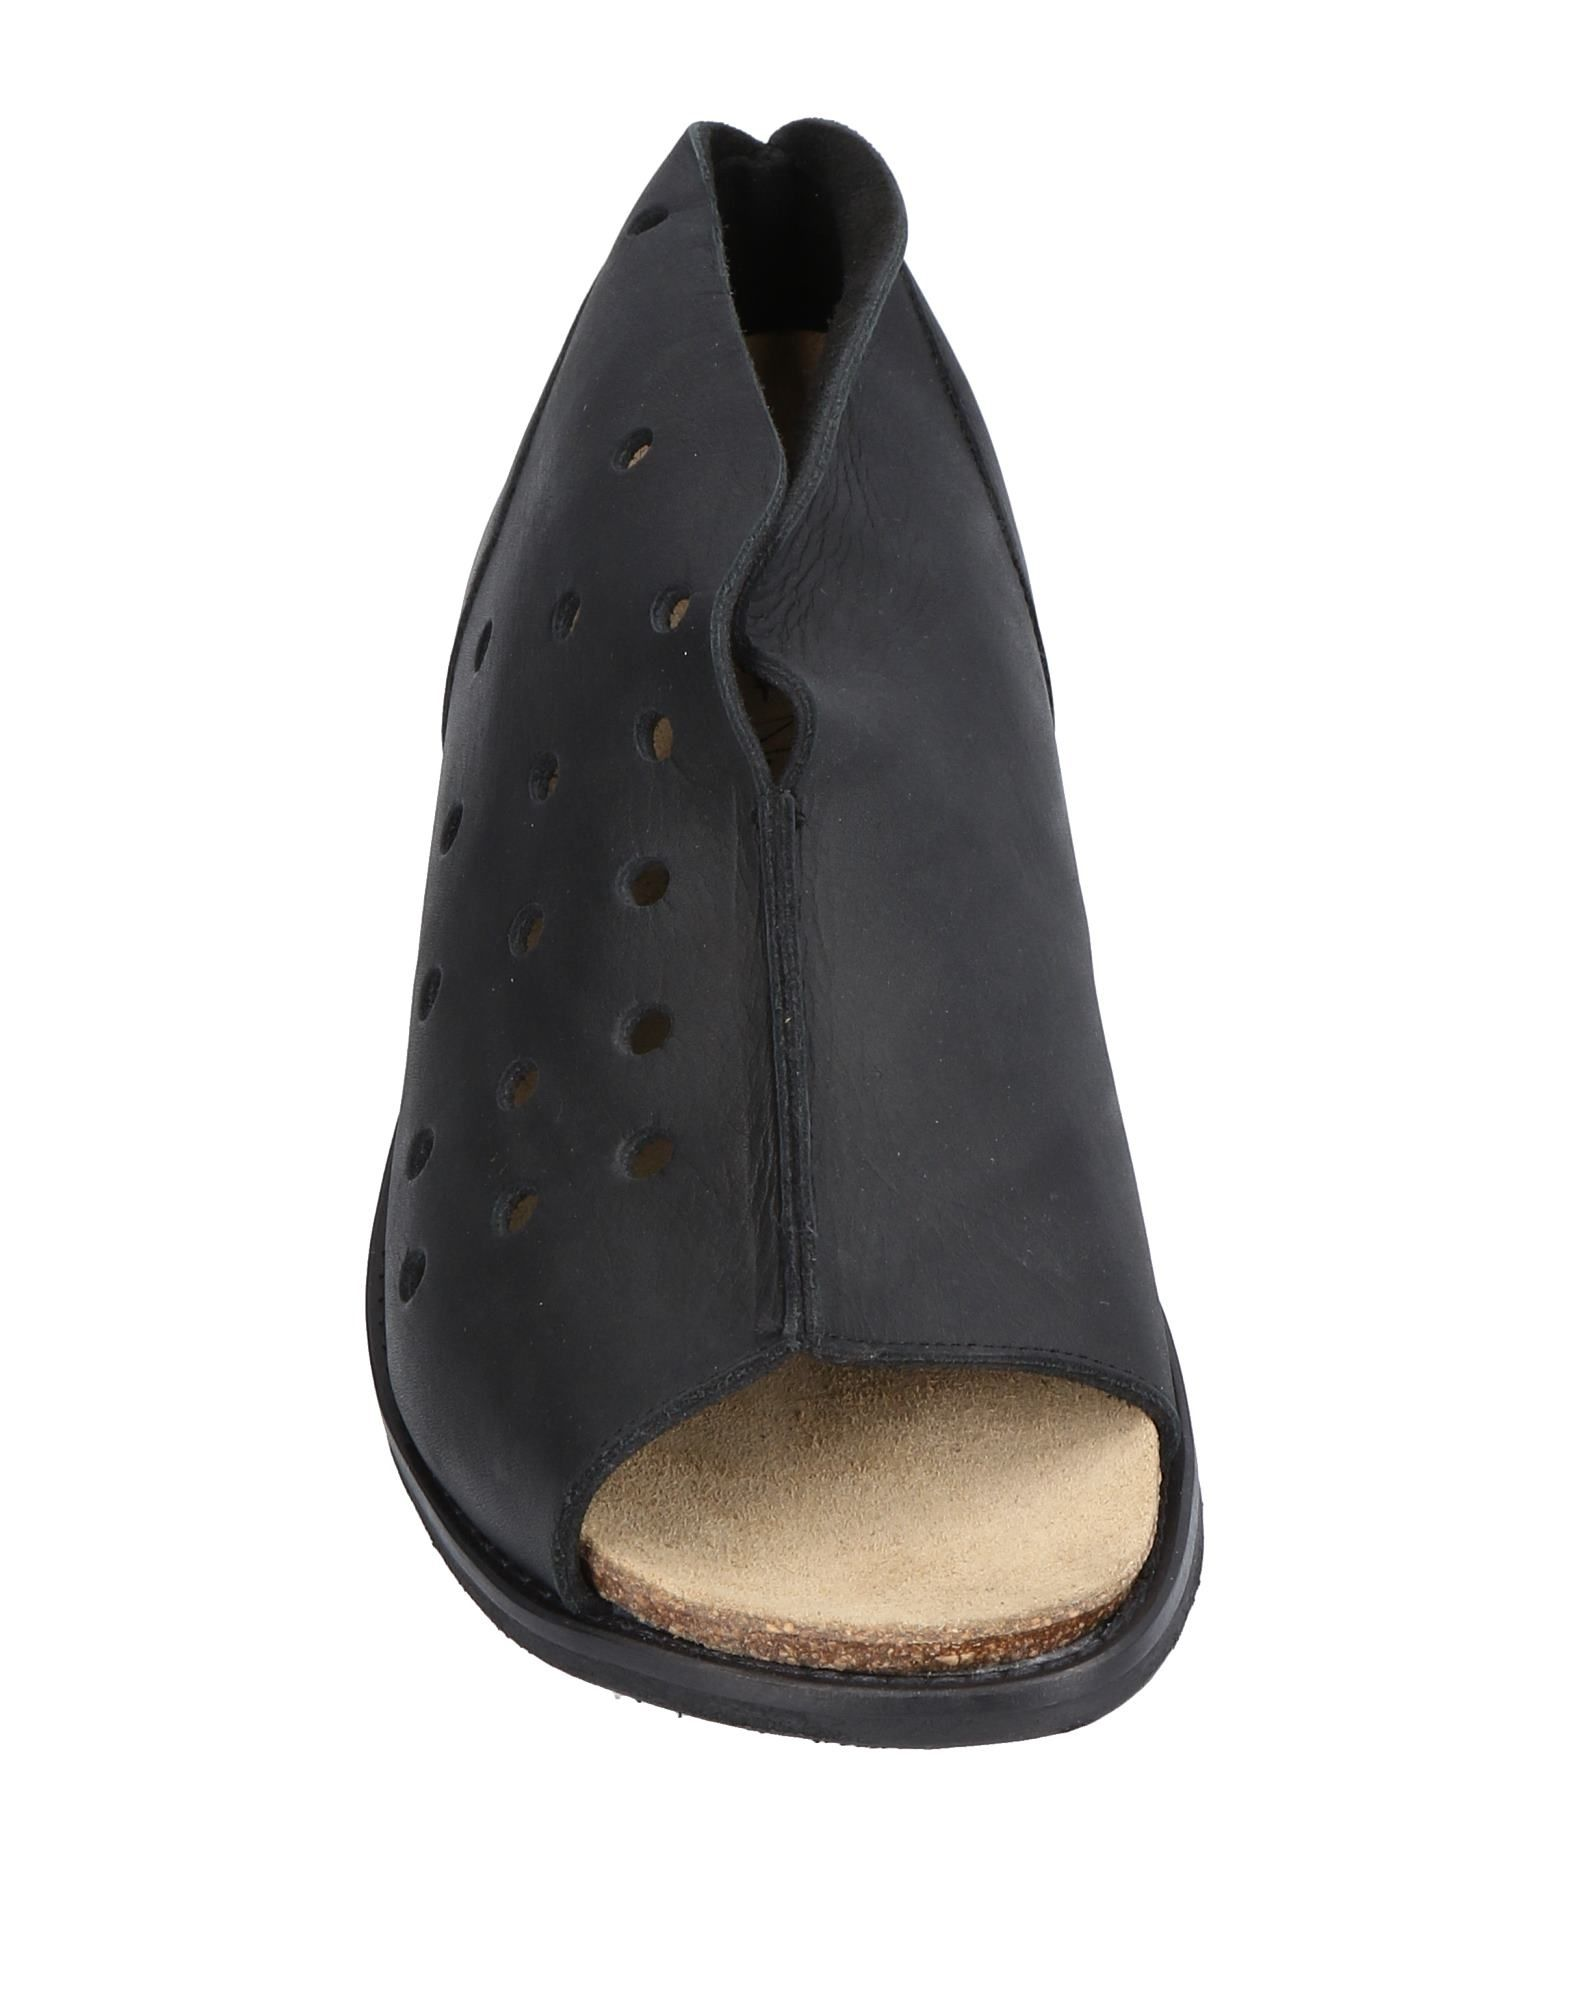 Peter Non Mokassins Herren  11508865OL Gute Qualität beliebte Schuhe